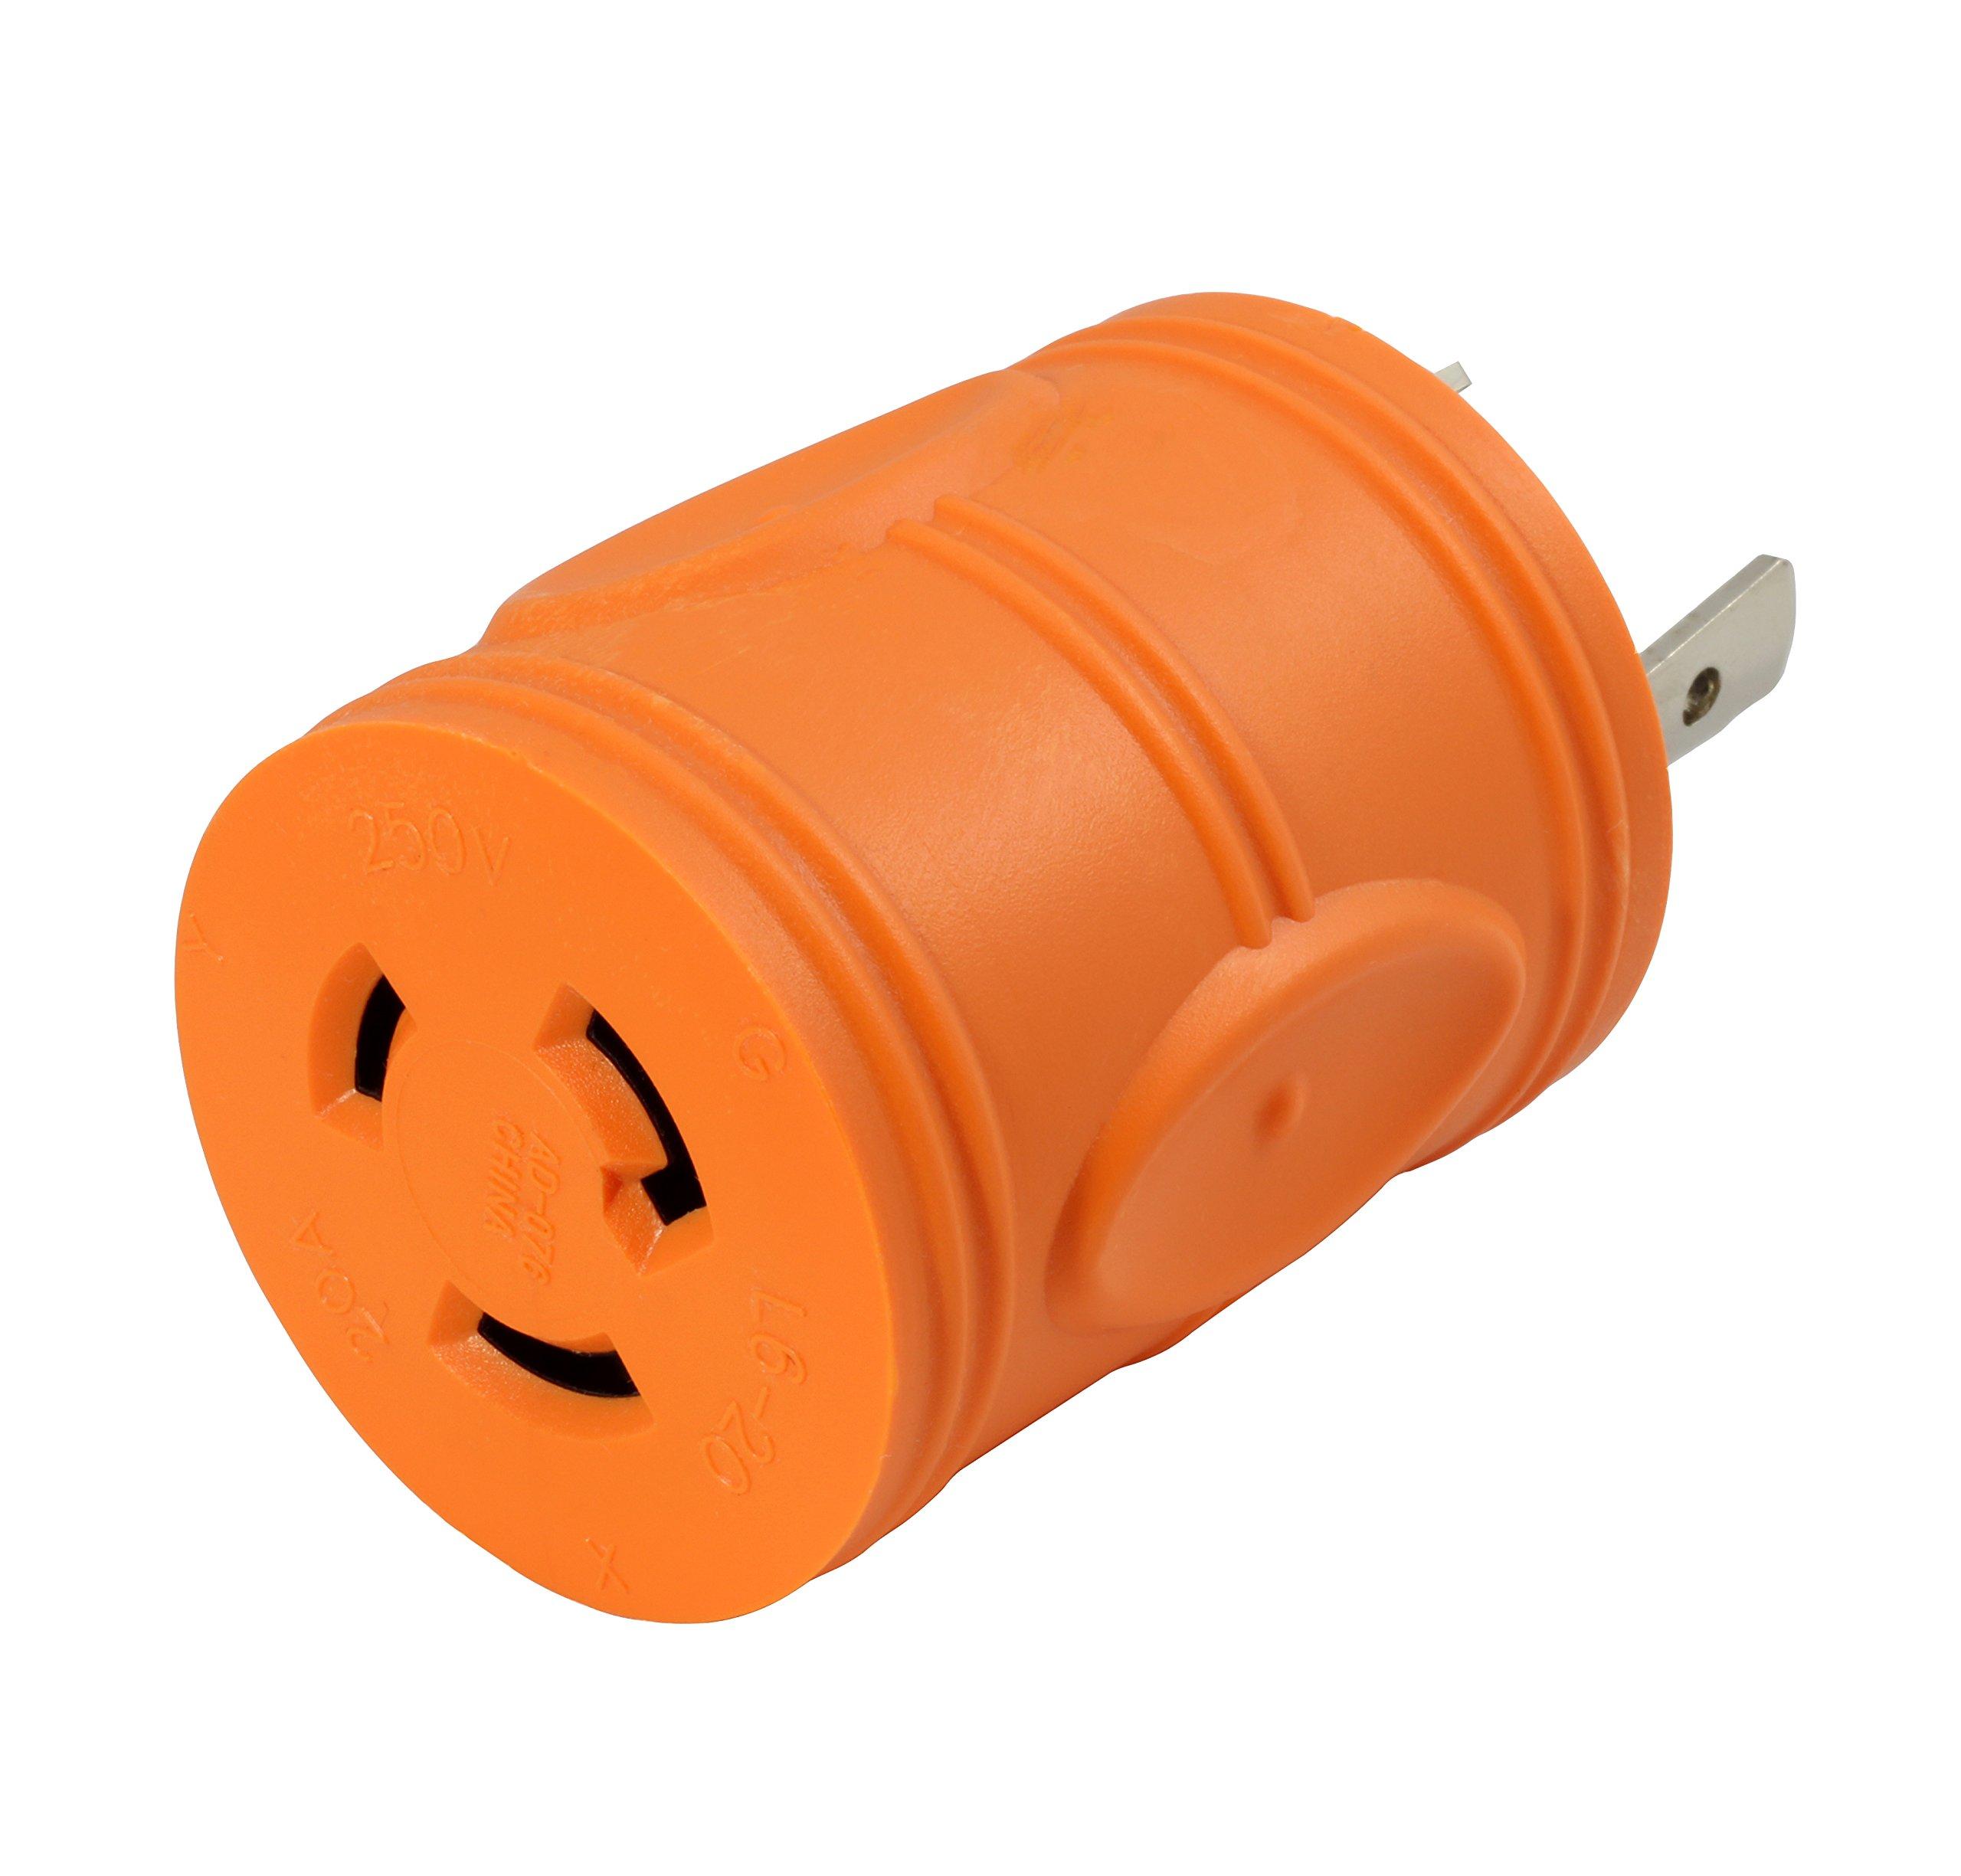 AC WORKS [ADL630L620] Plug Adapter L6-30P 30Amp 250Volt Male Plug to L6-20R 20Amp 250Volt Locking Female Connector